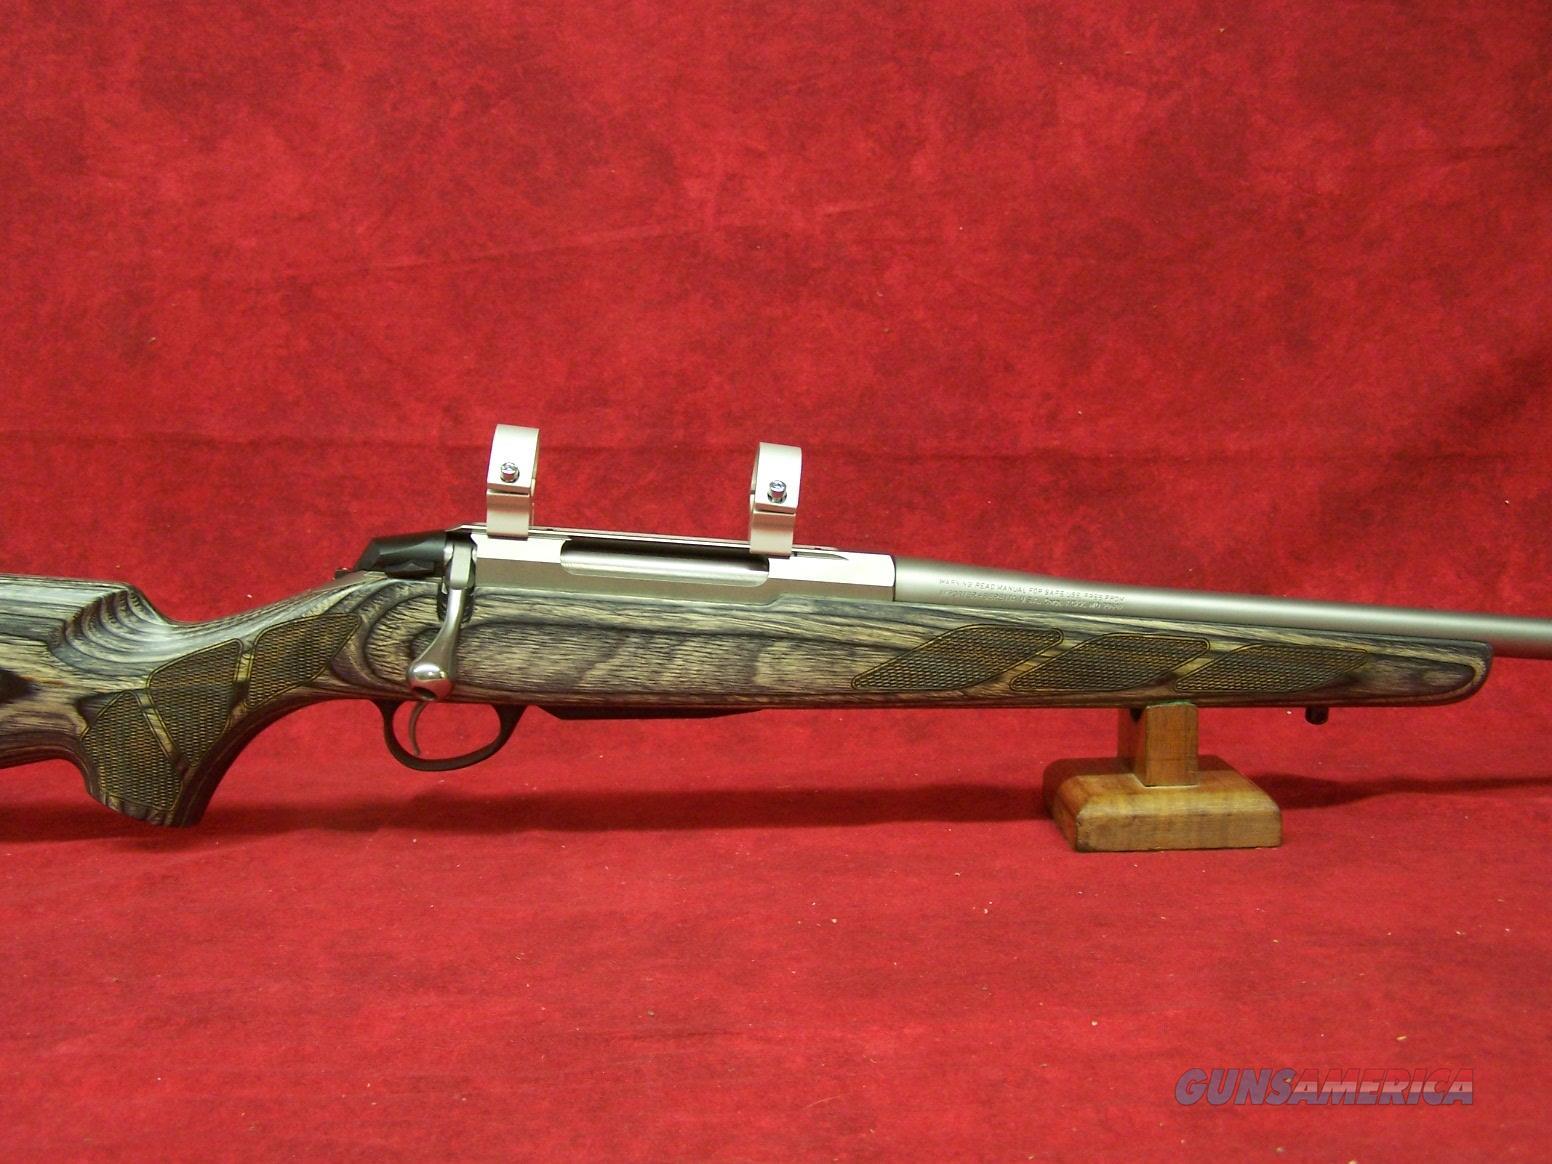 "Tikka T3 Laminate SS 7mm Rem Mag 24.3"" barrel (JRTG370)   Guns > Rifles > Tikka Rifles > T3"